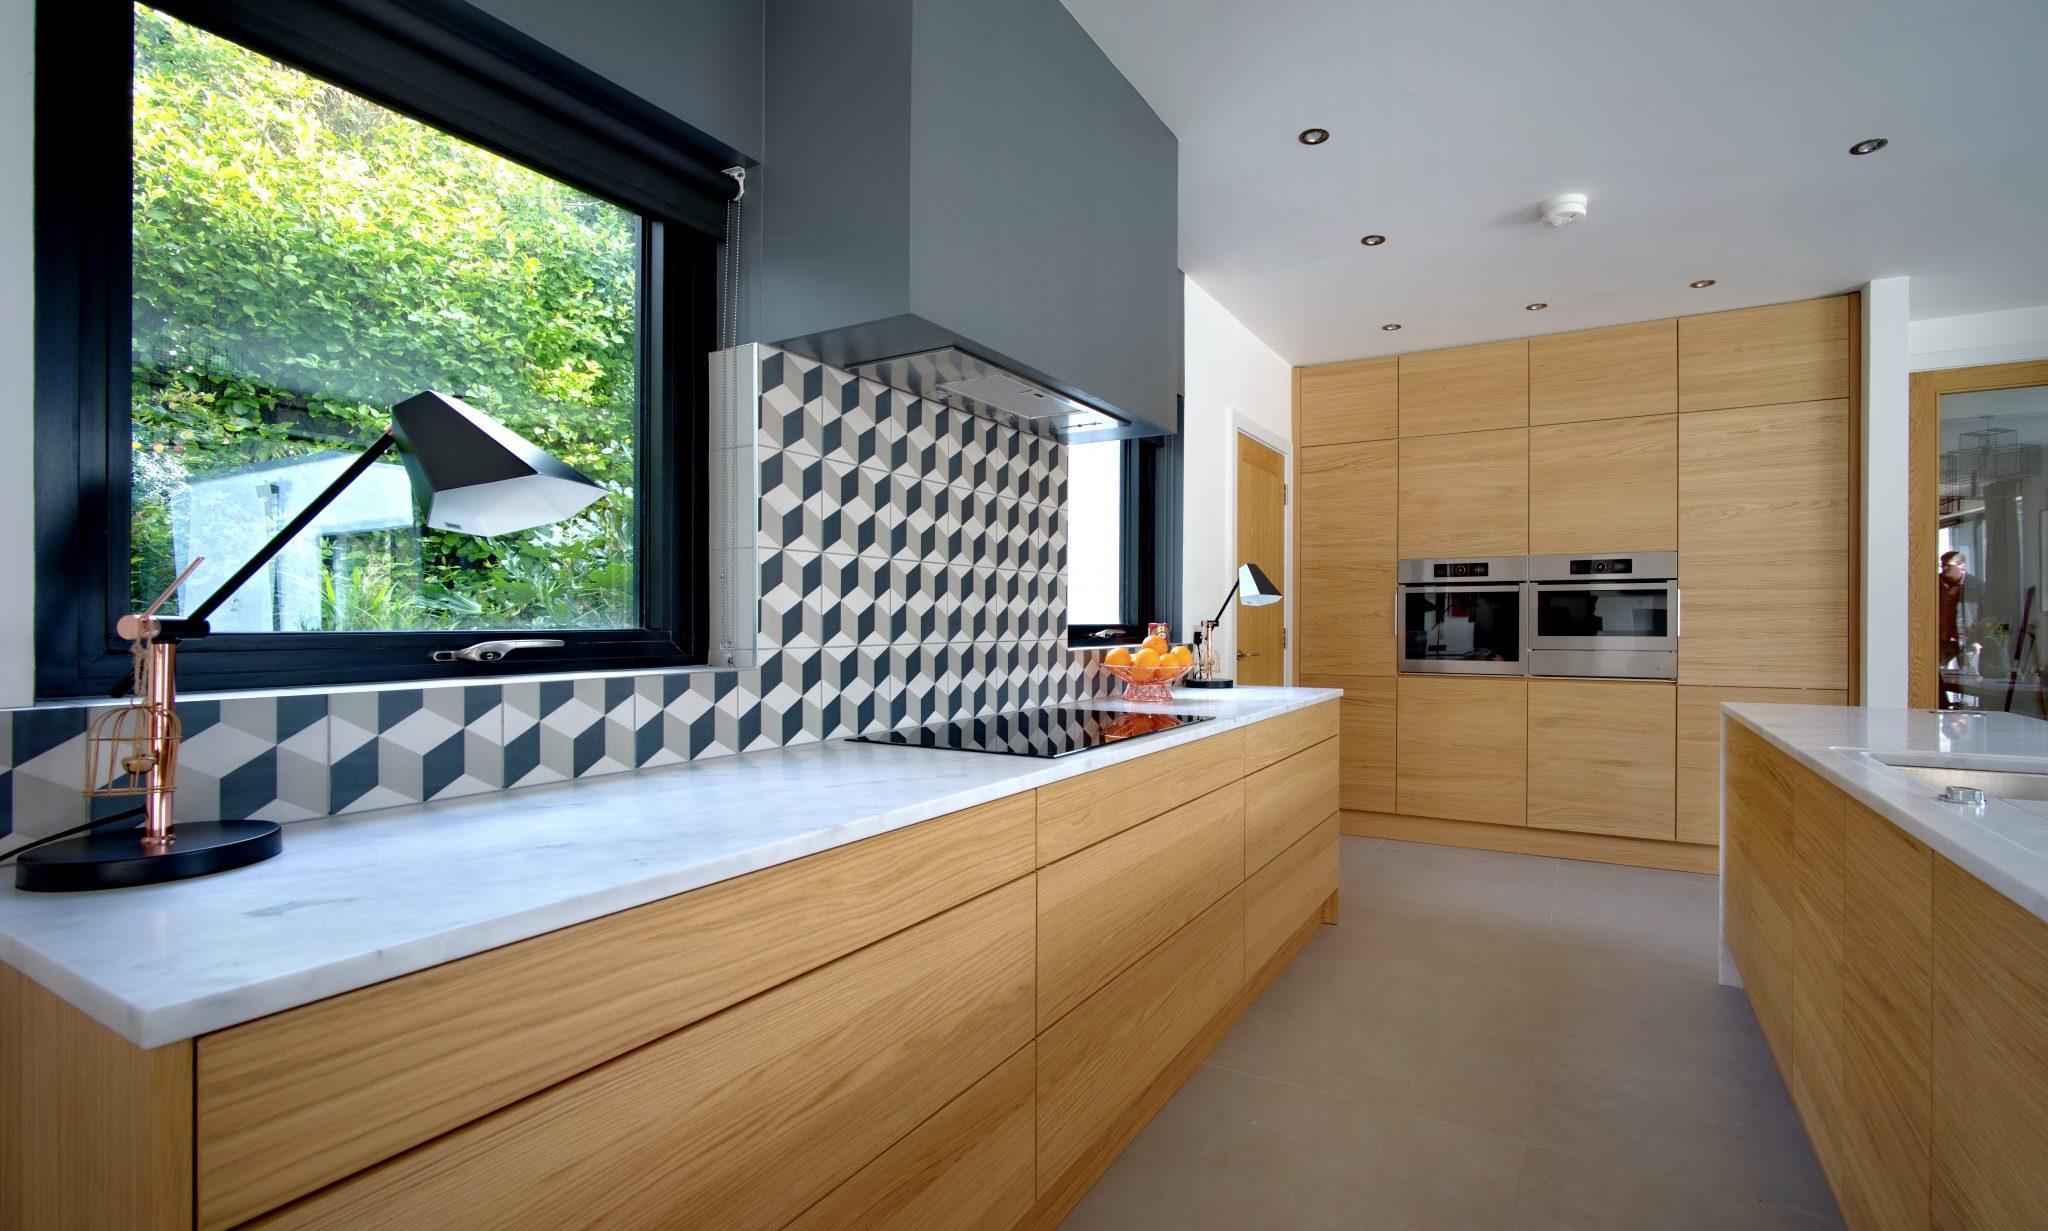 Tiles-Adornas Kitchens-Kitchens Bangor-Kitchens Belfast-Kitchen showrooms bangor-Modern Kitchens-German Kitchens-©AdornasKitchens2017